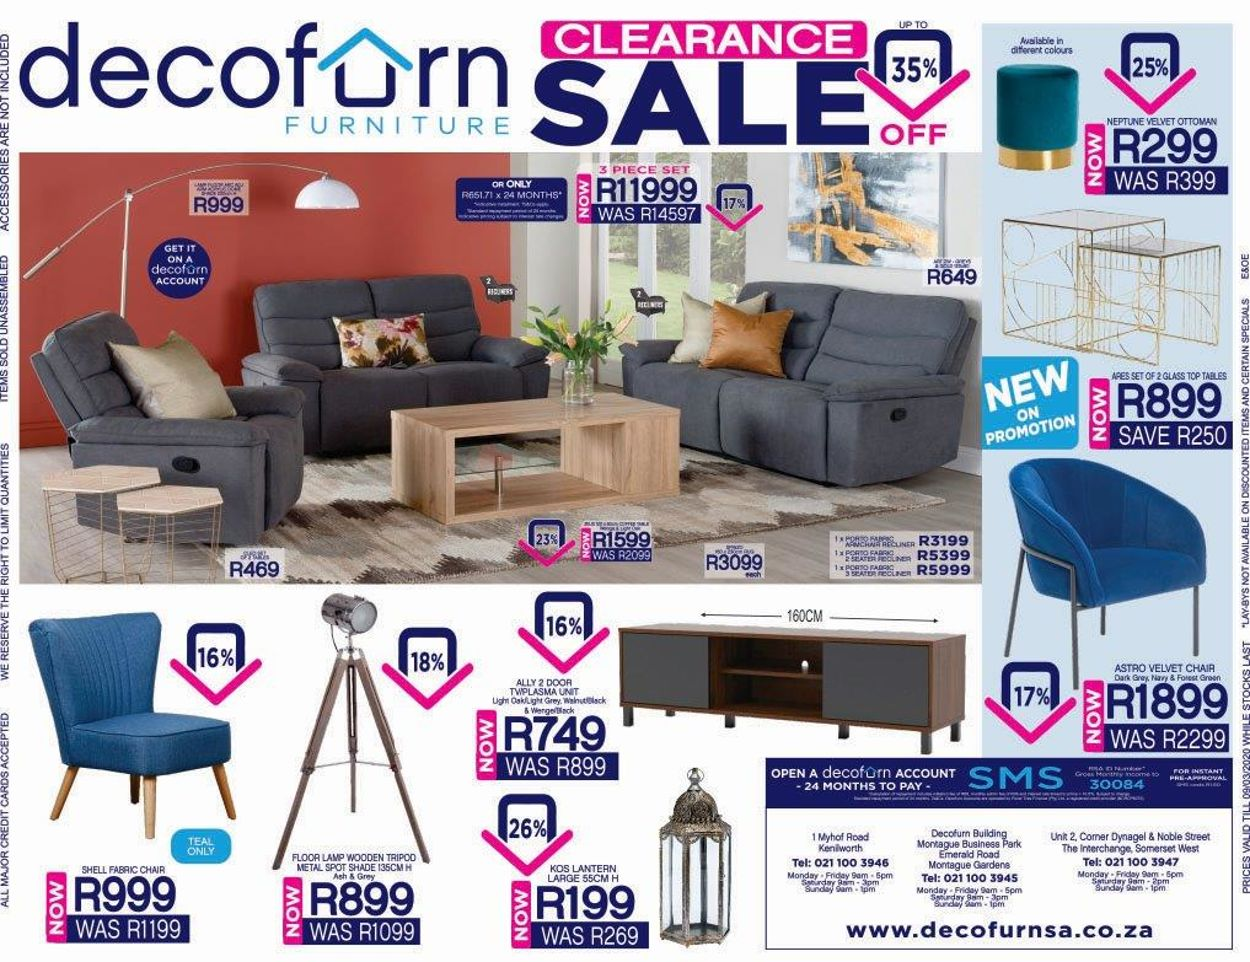 Decofurn Factory Shop Catalogue - 2020/03/02-2020/03/09